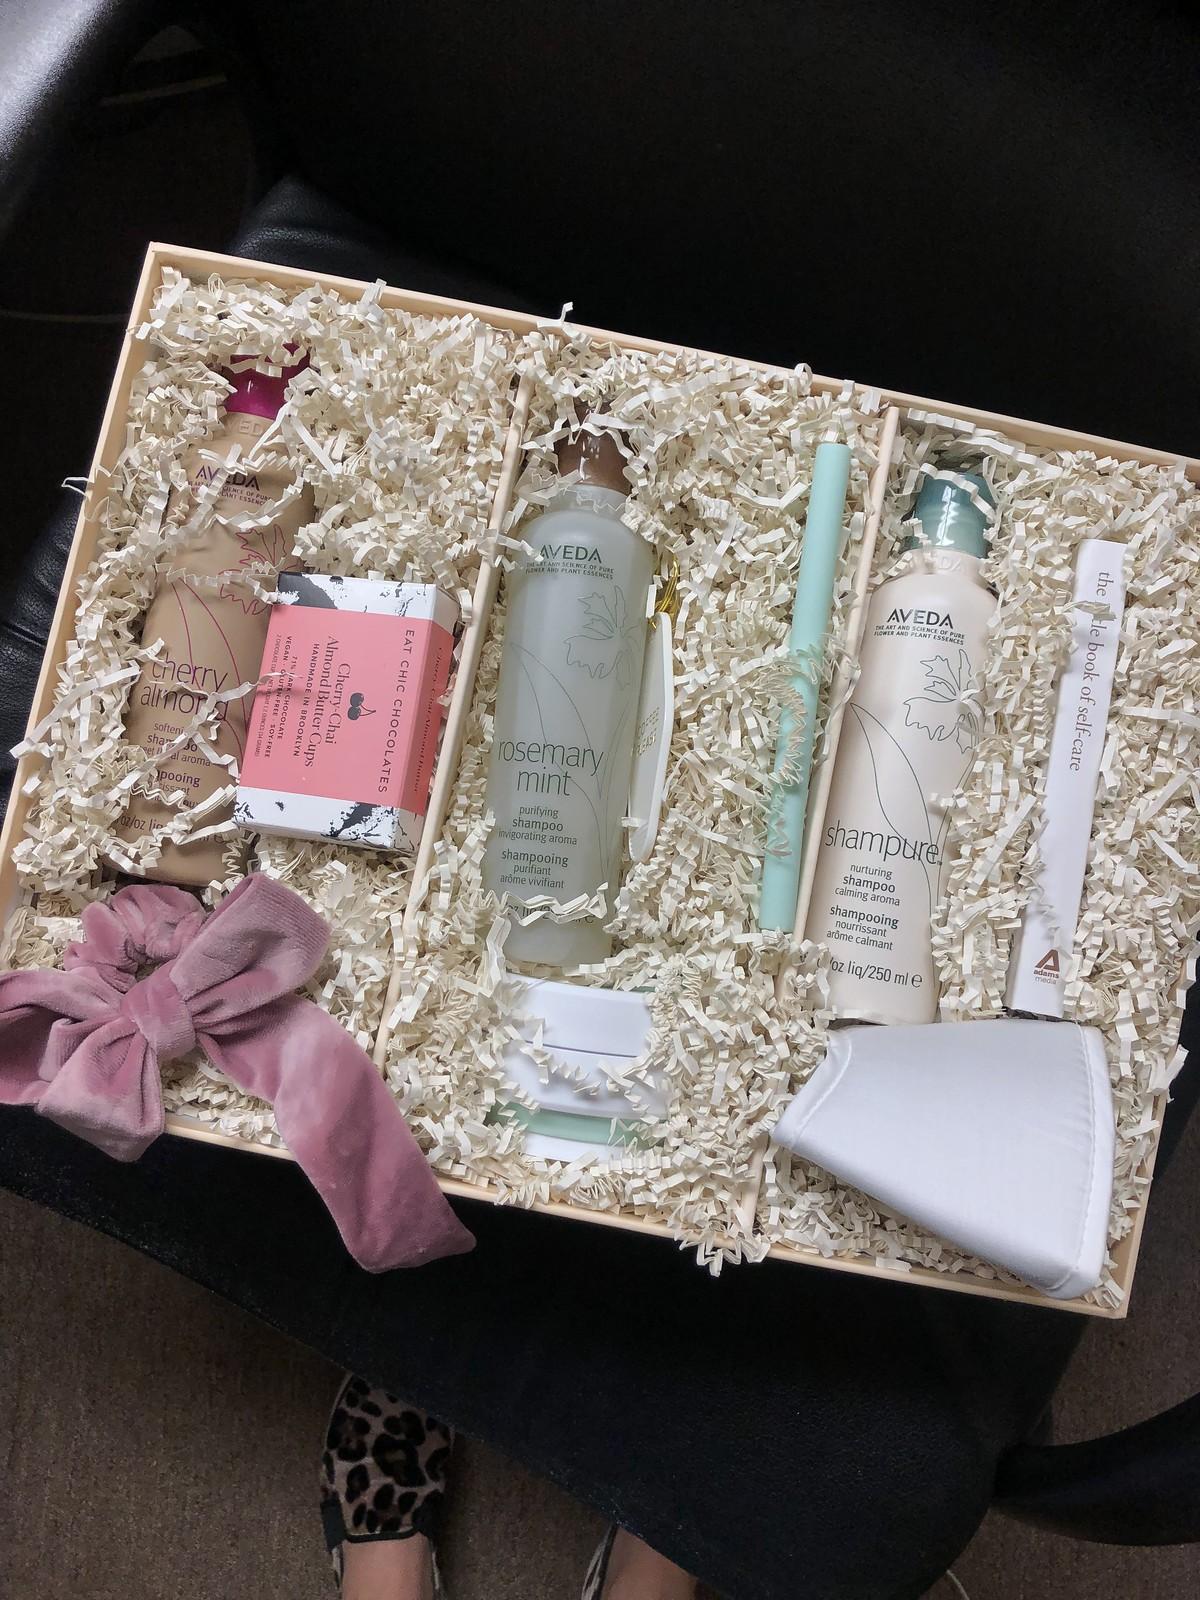 Aveda Signature Hair Care Products Shampoo